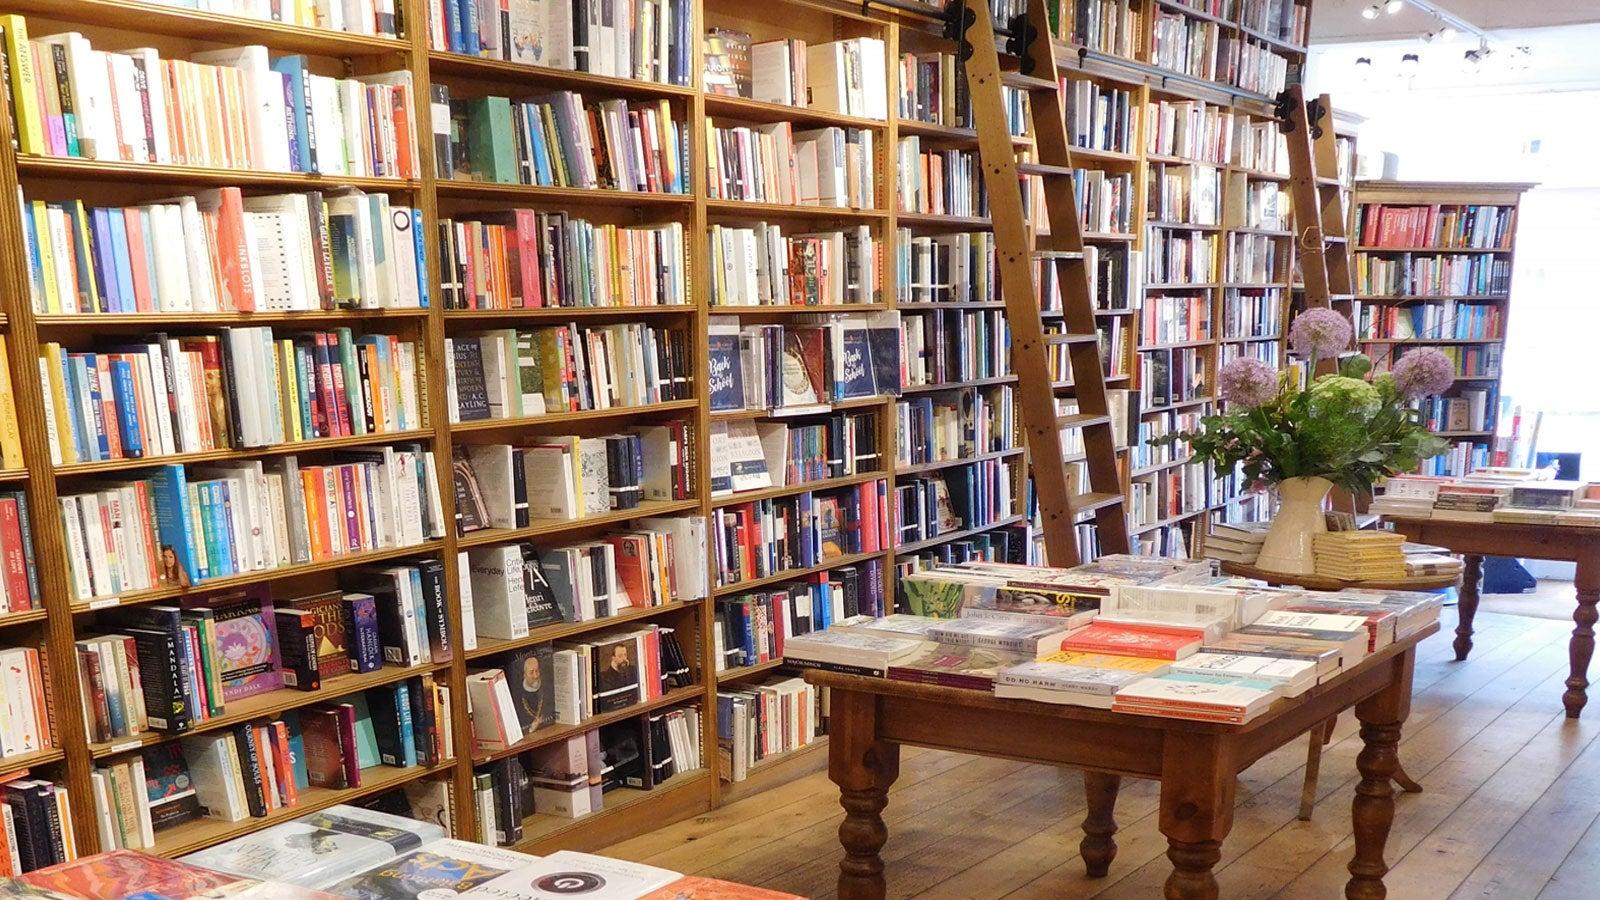 Interior of Topping & Co bookshop showing full shelves of books